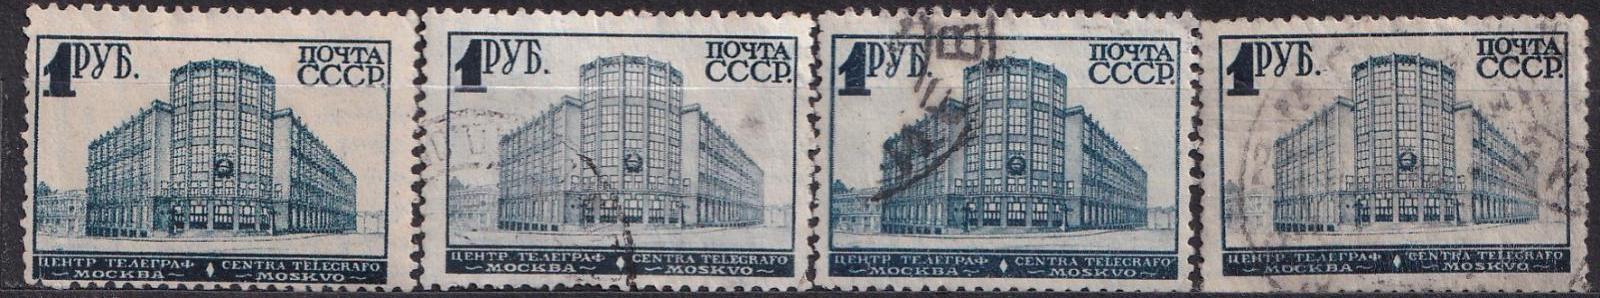 SSSR-CCCP 382 Veletrh 1930, ražené různé barvy, papír